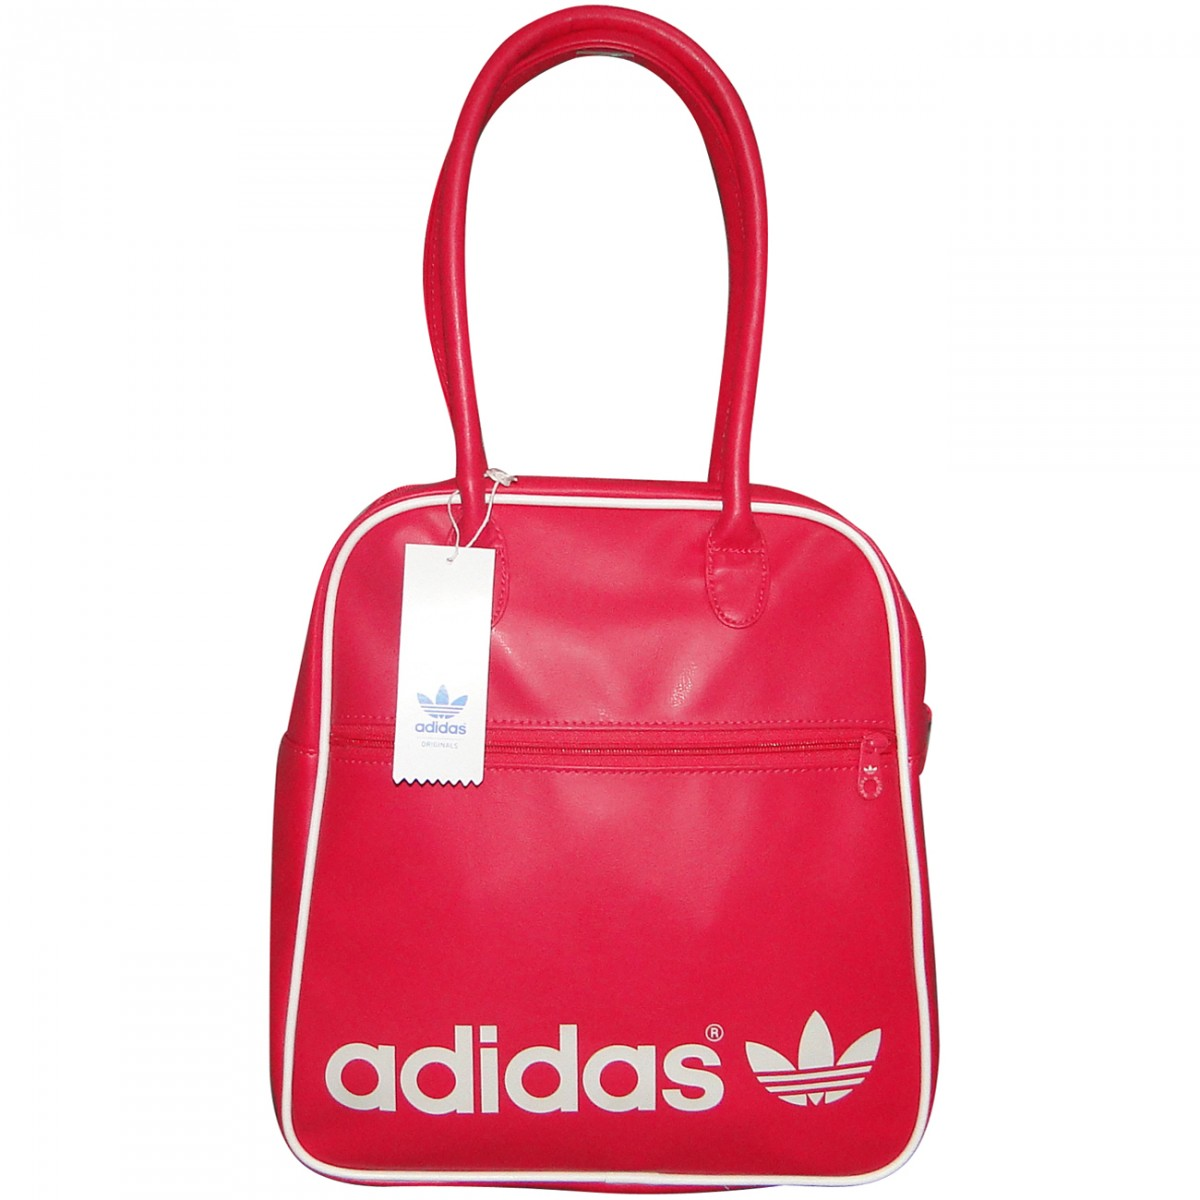 1a7bfdb15 Bolsa Adidas Bowlingbag G74936 - Pink/Branco - Chuteira Nike, Adidas.  Sandalias Femininas. Sandy Calçados